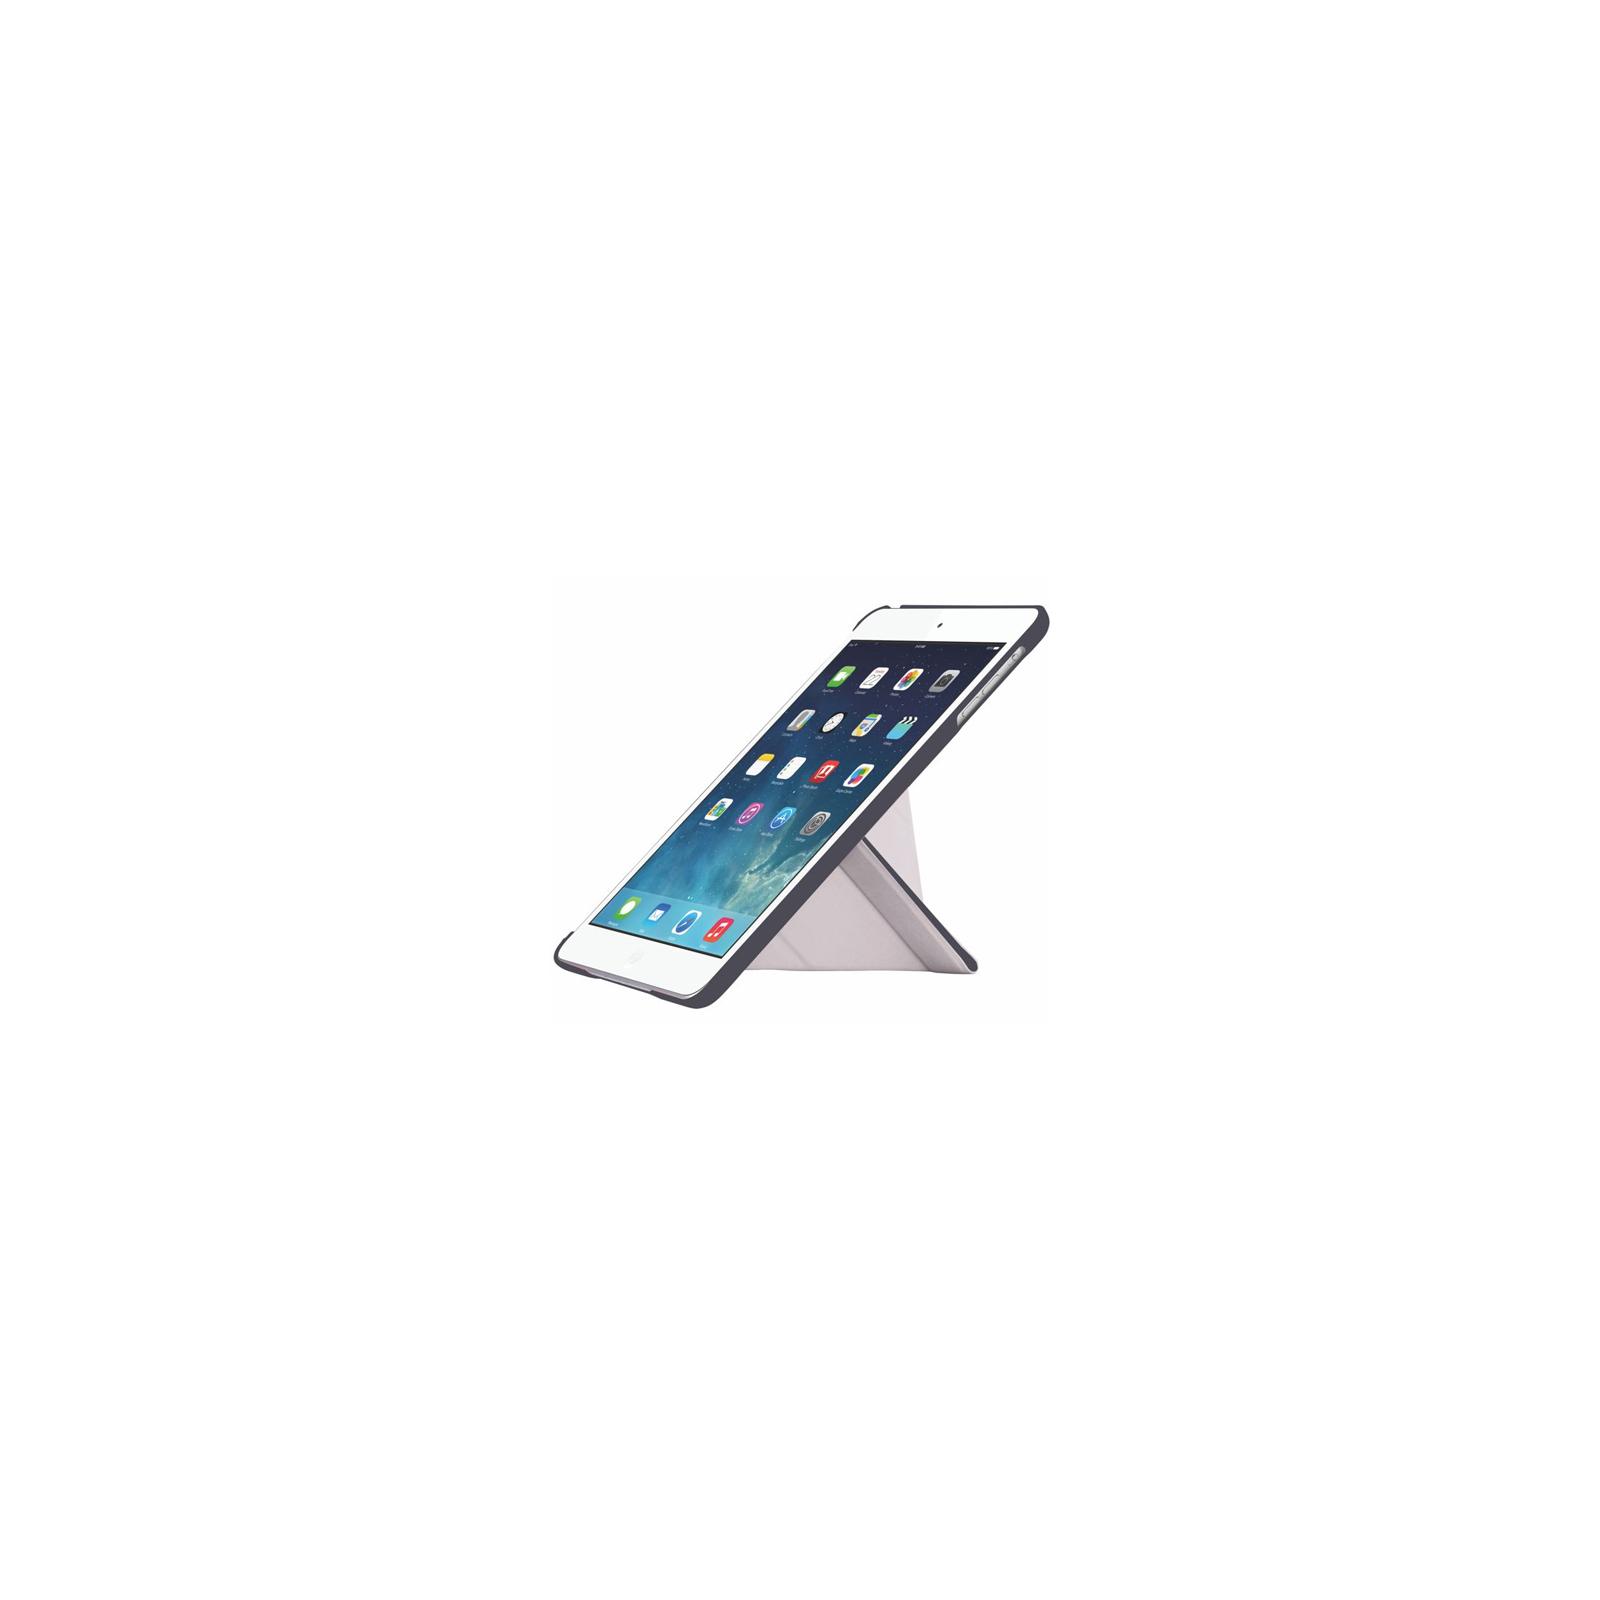 Чехол для планшета OZAKI iPad Air O!coat Slim-Y 360° Multiangle (OC110DG) изображение 2